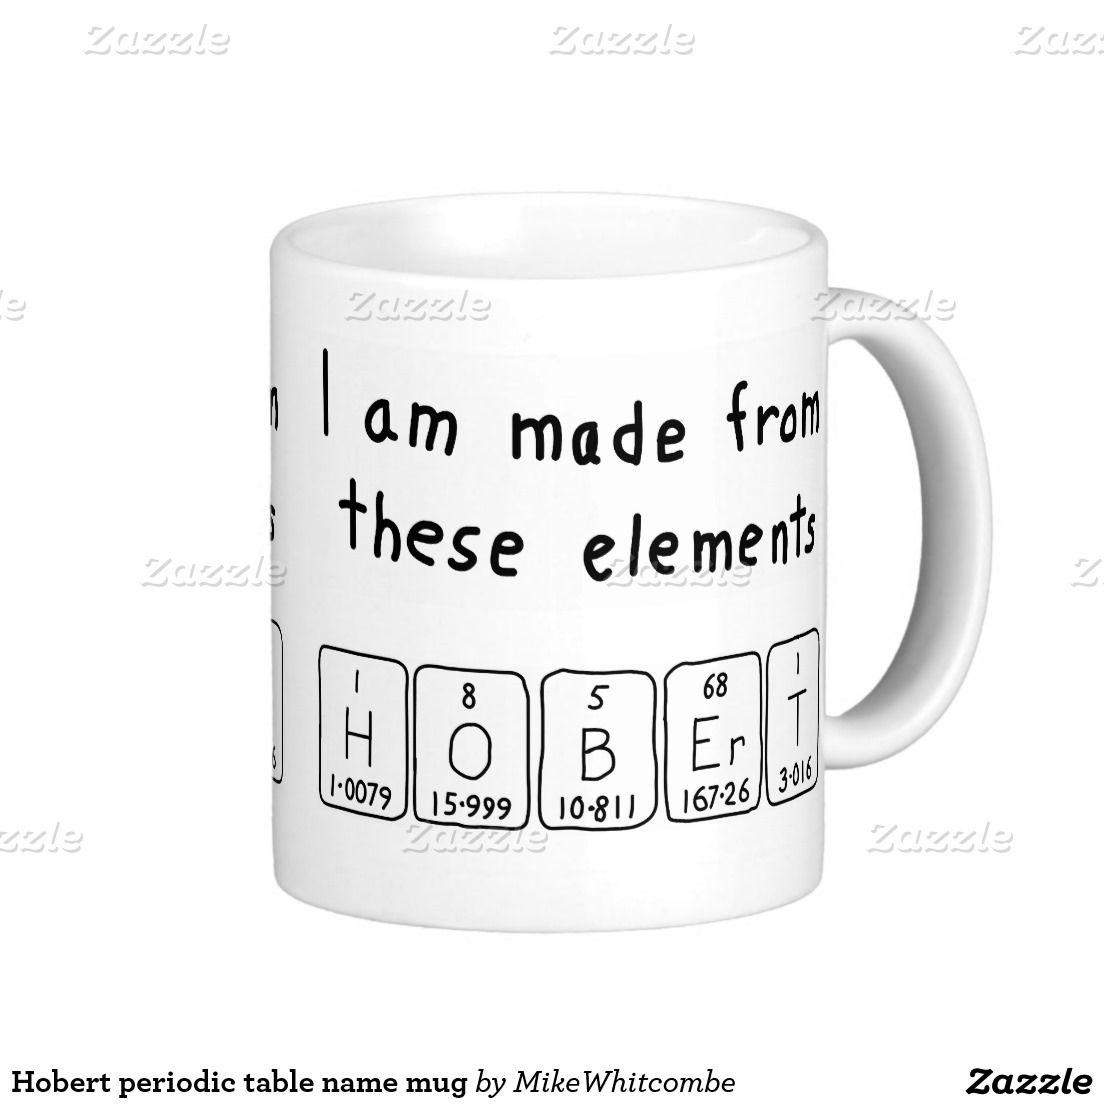 Hobert periodic table name mug november 2015 sales from my zazzle hobert periodic table name mug urtaz Image collections